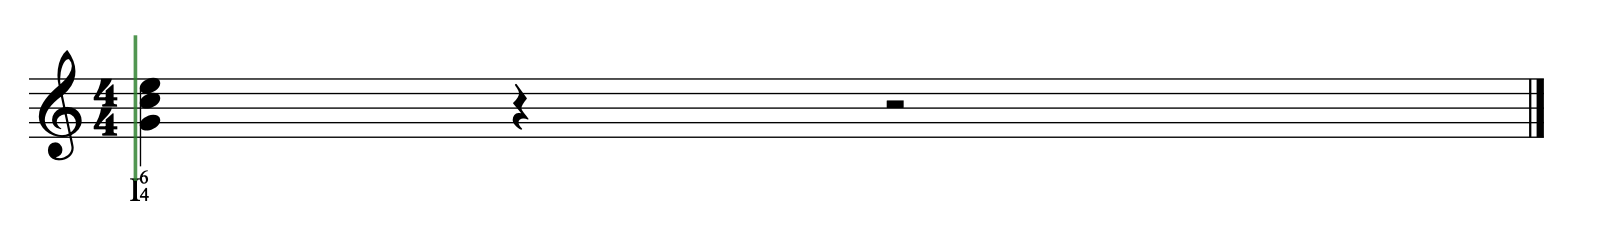 Roman Numeral : Figured Bass in Sibelius